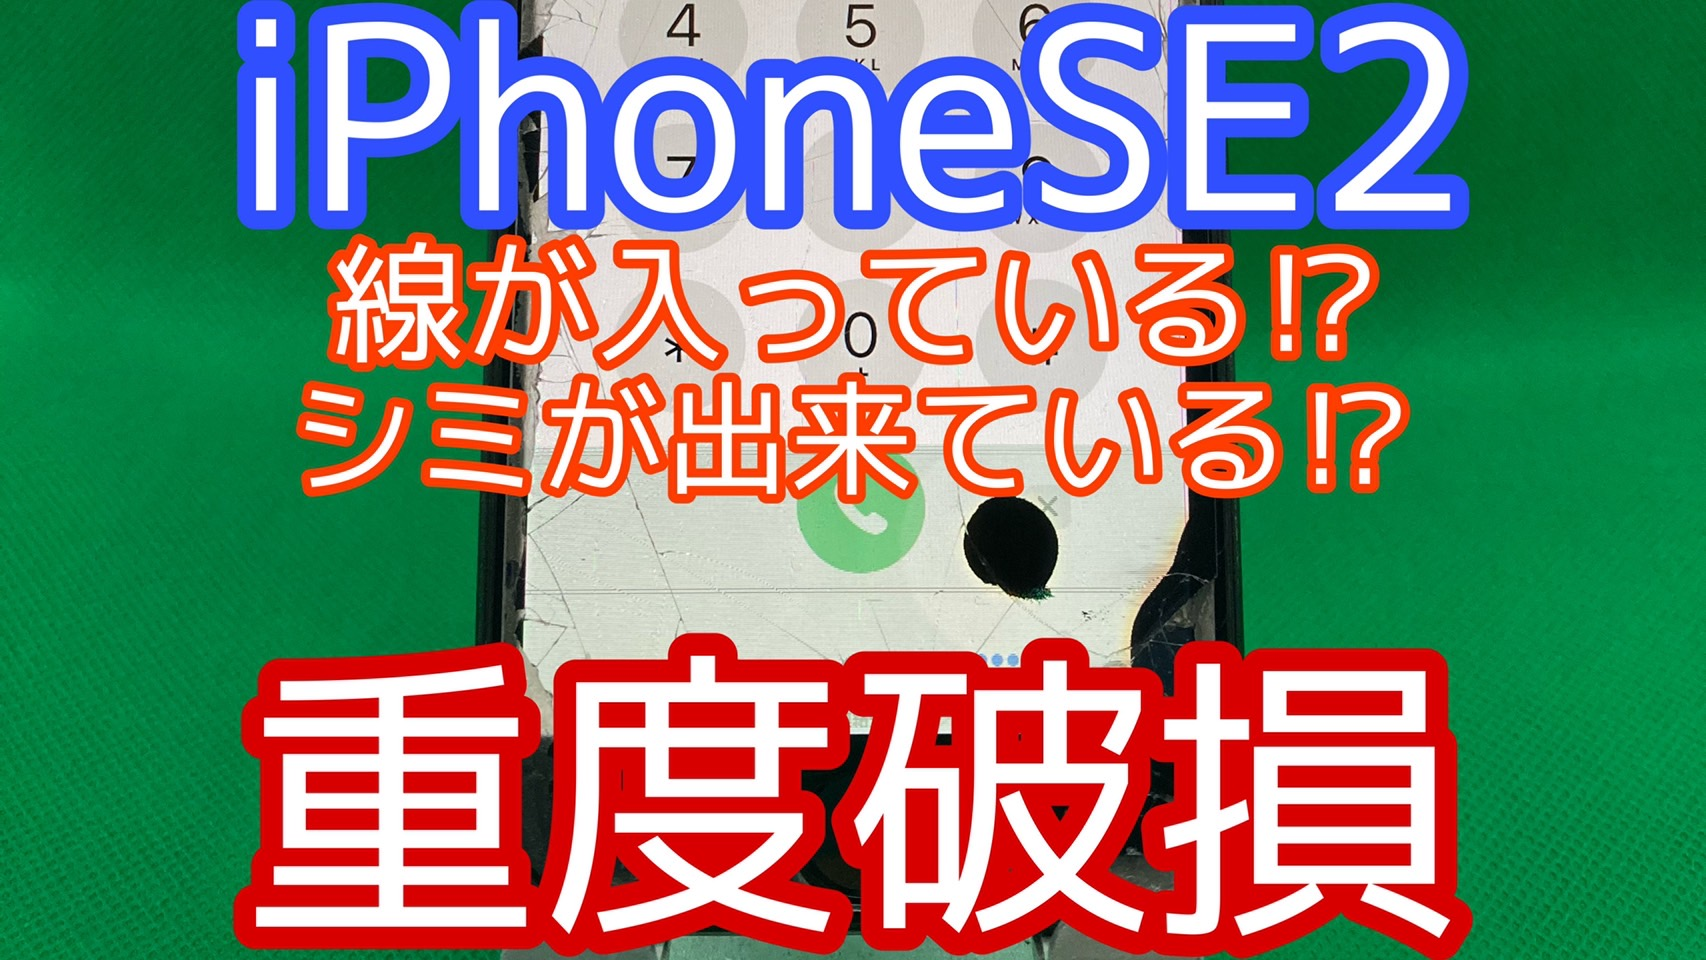 iPhoneSE2アイキャッチ画像